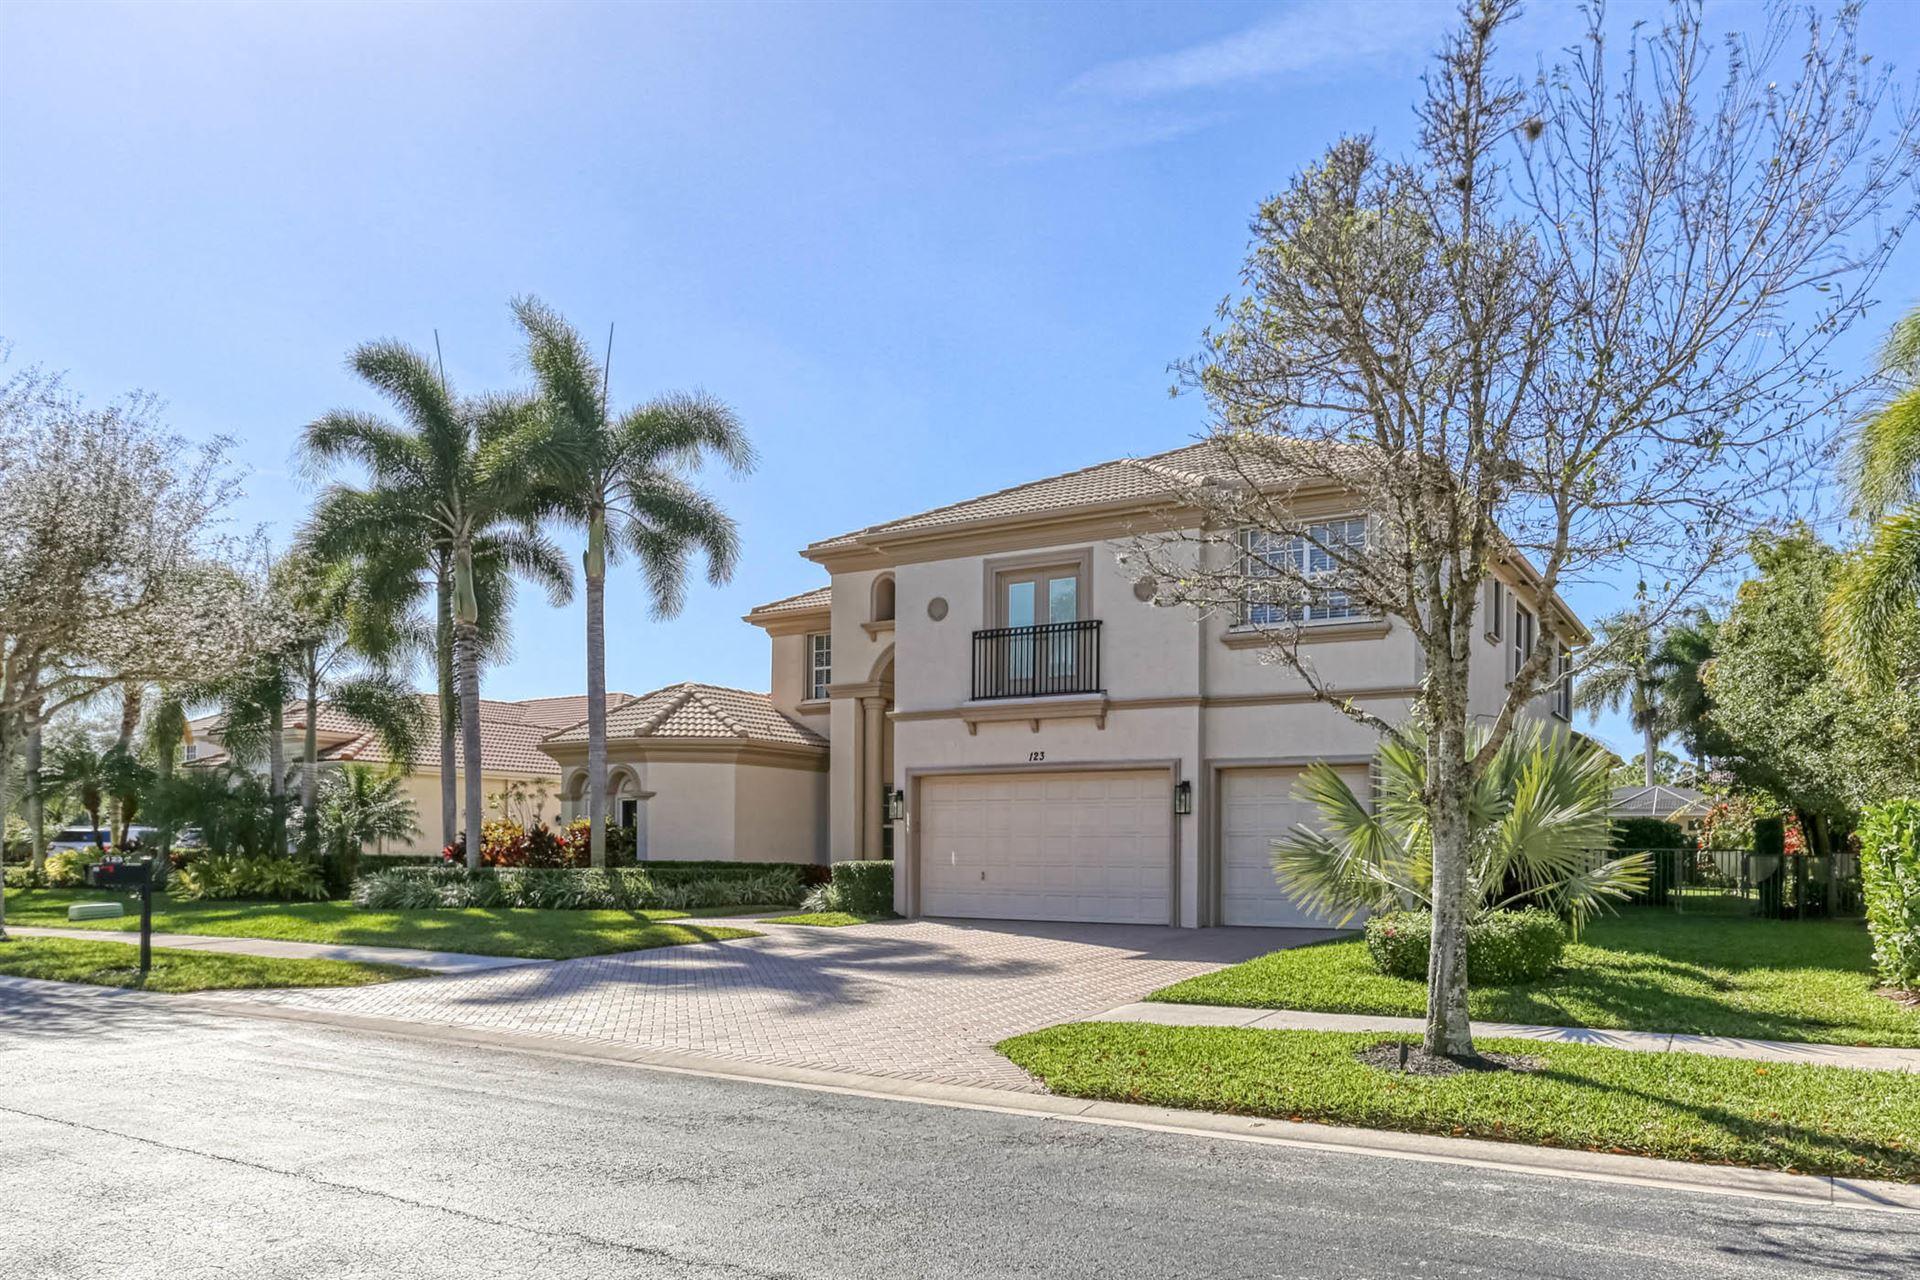 123 Bryce Lane, Jupiter, FL 33458 - #: RX-10688190